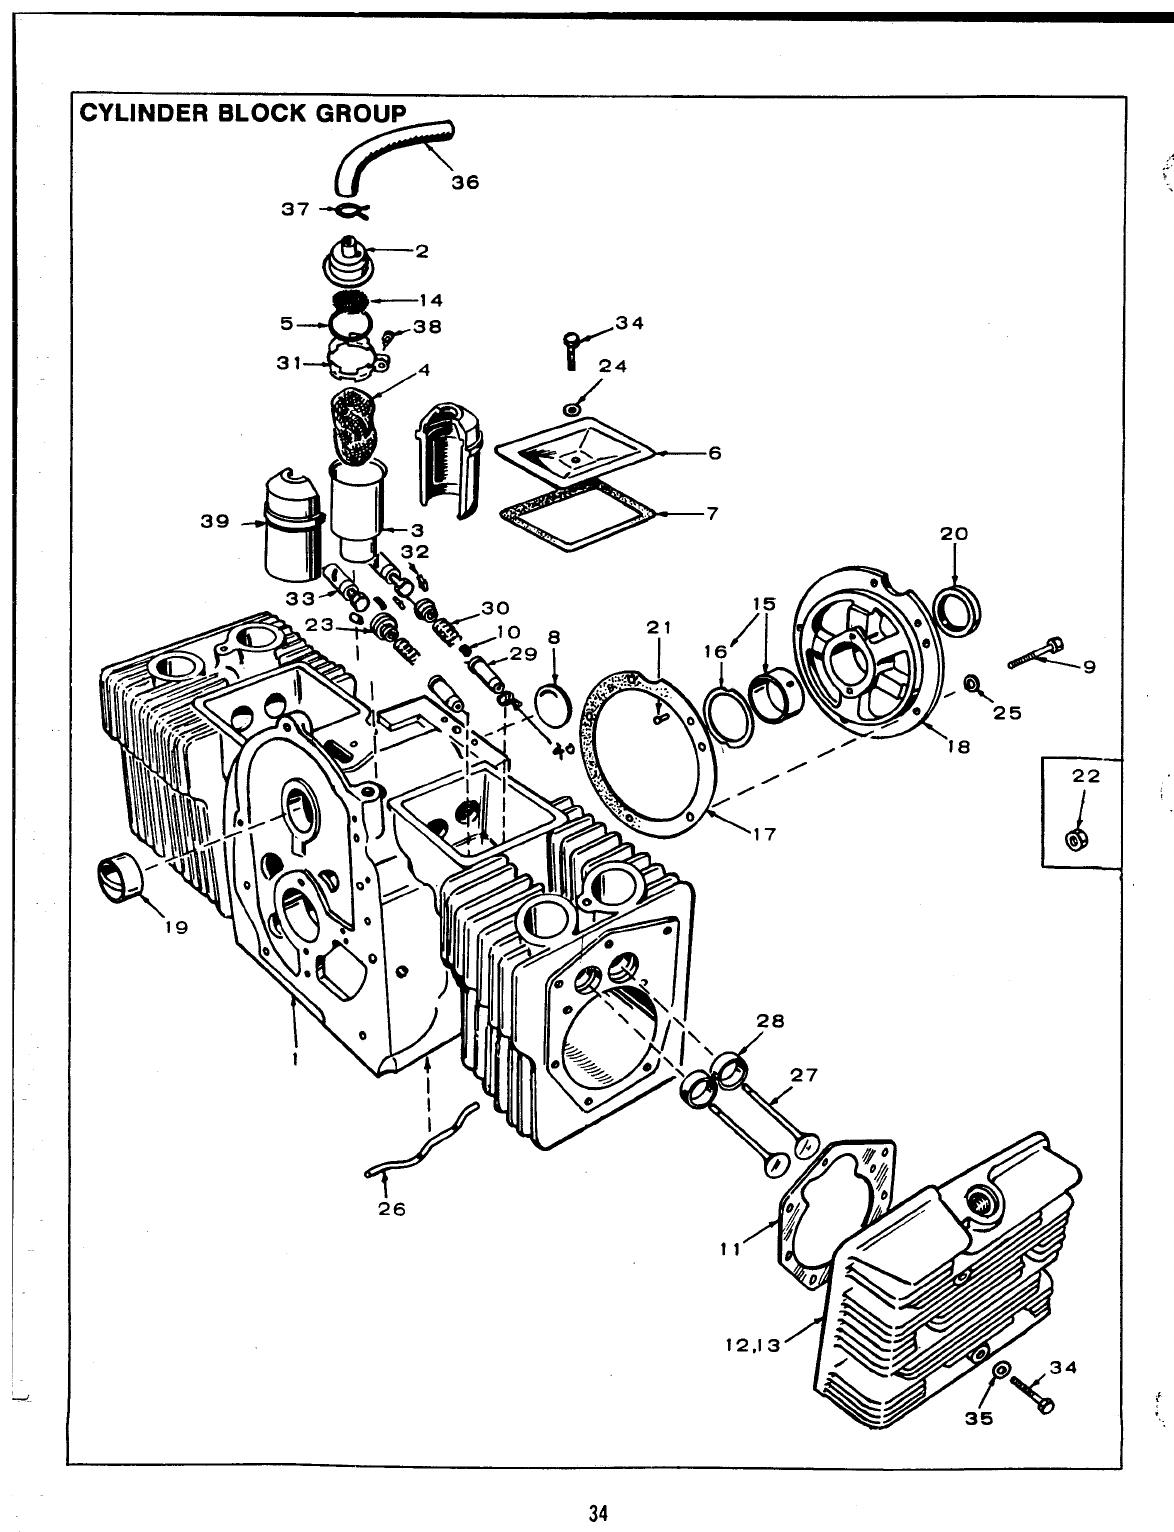 Lfm3250 927 0251 Onan CCKB (20HP Tractor) Engine Major